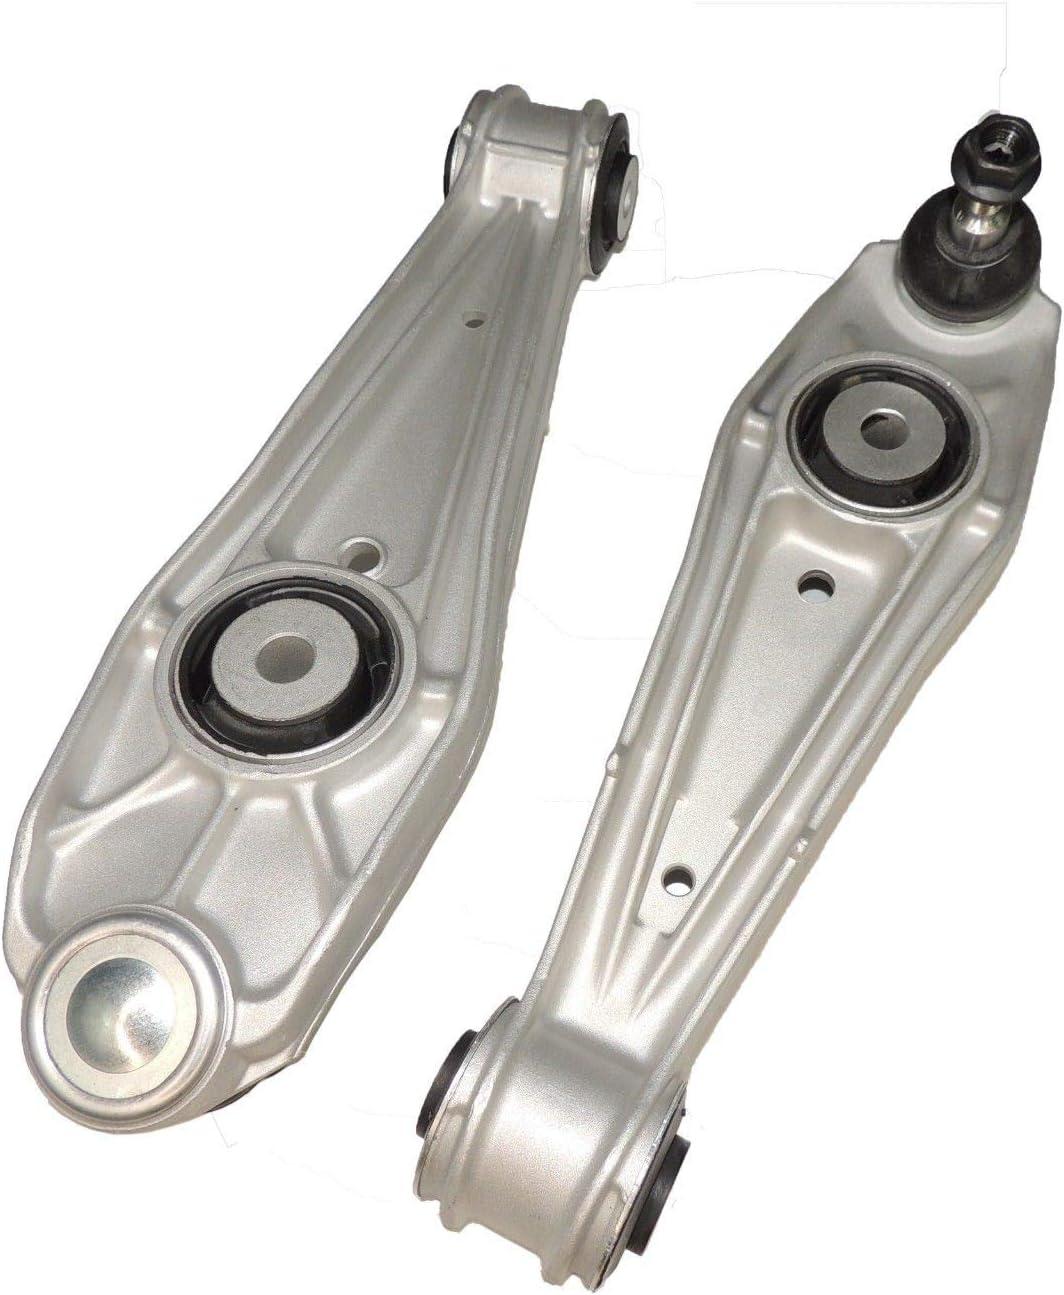 MTC 7514//996-341-053-17 Control Arm Front or Rear Lower, Porsche models